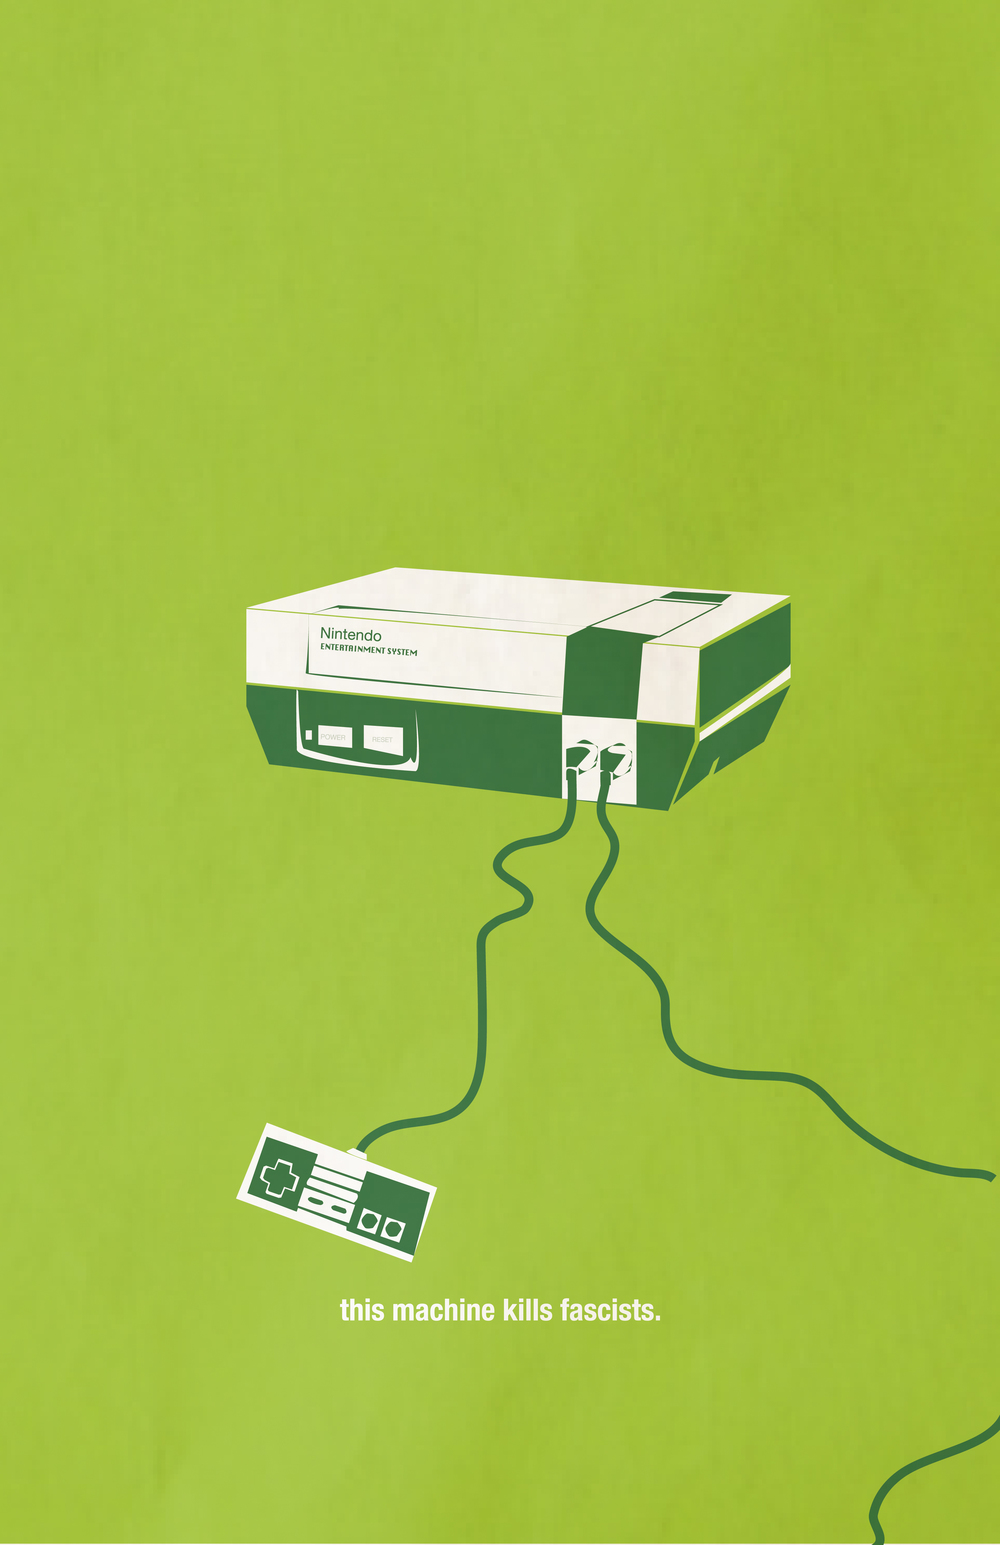 This Machine KillsFascists: Console